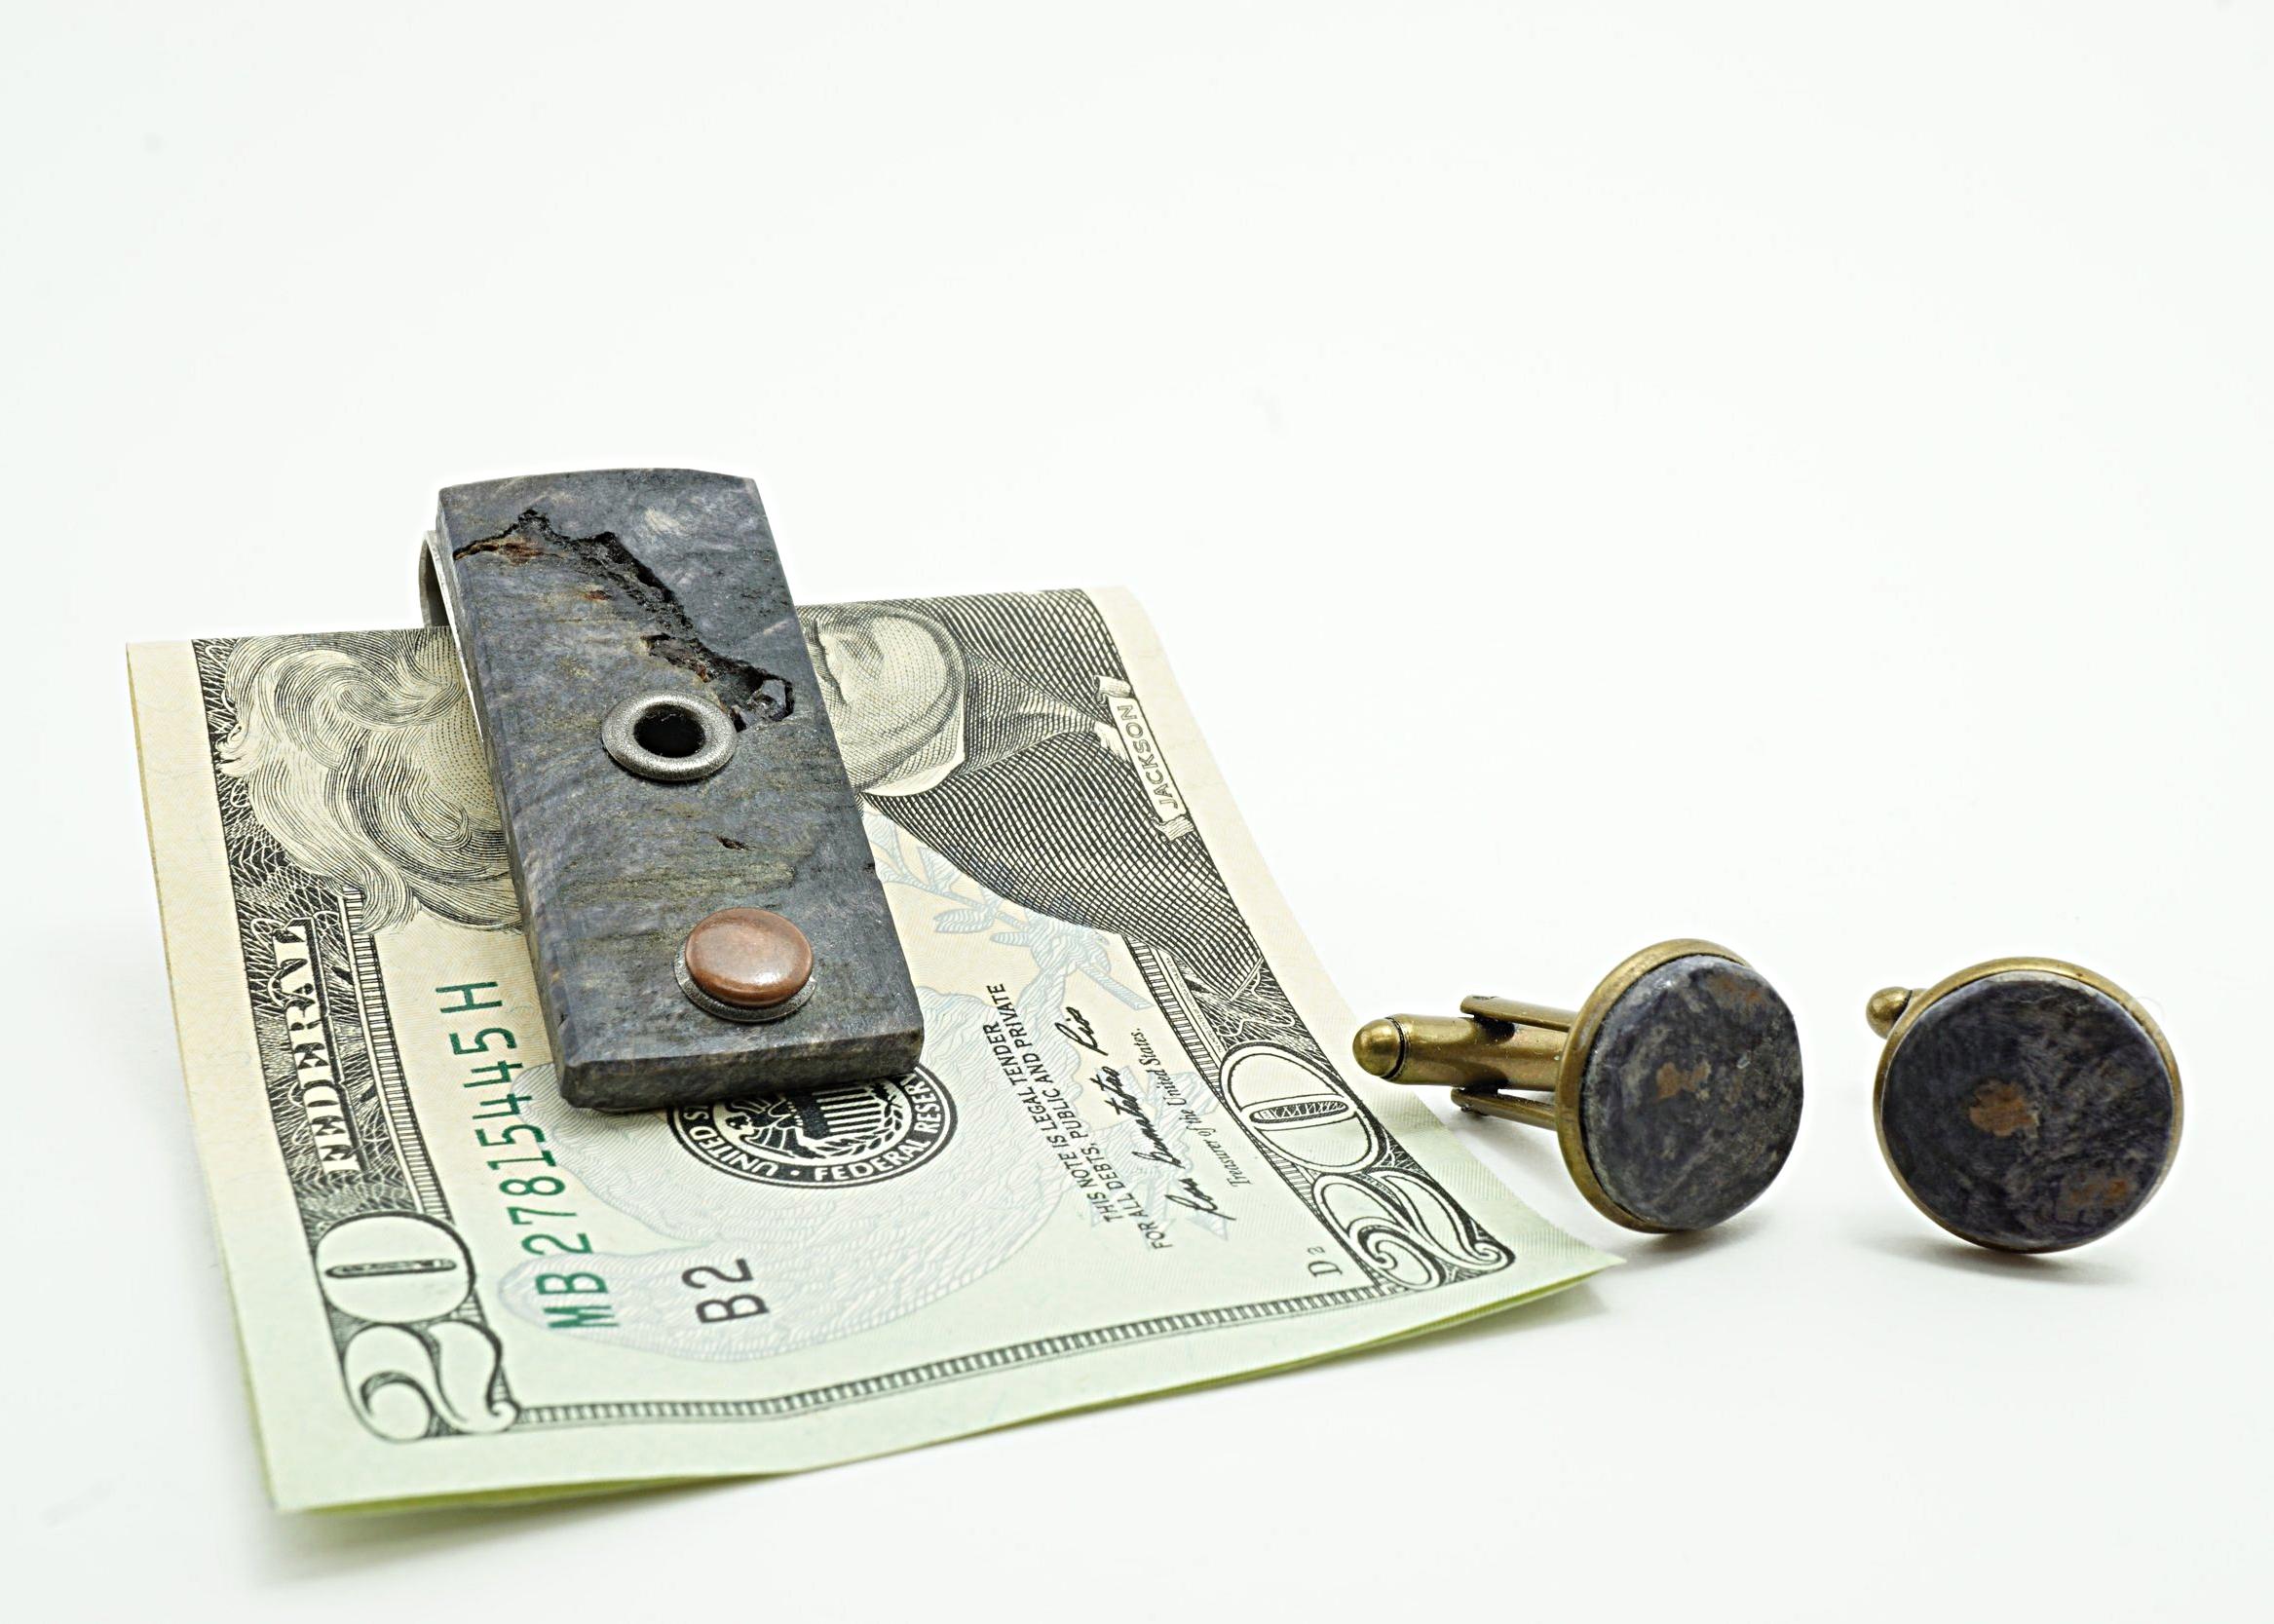 Buckeye burl money clip and cufflinks